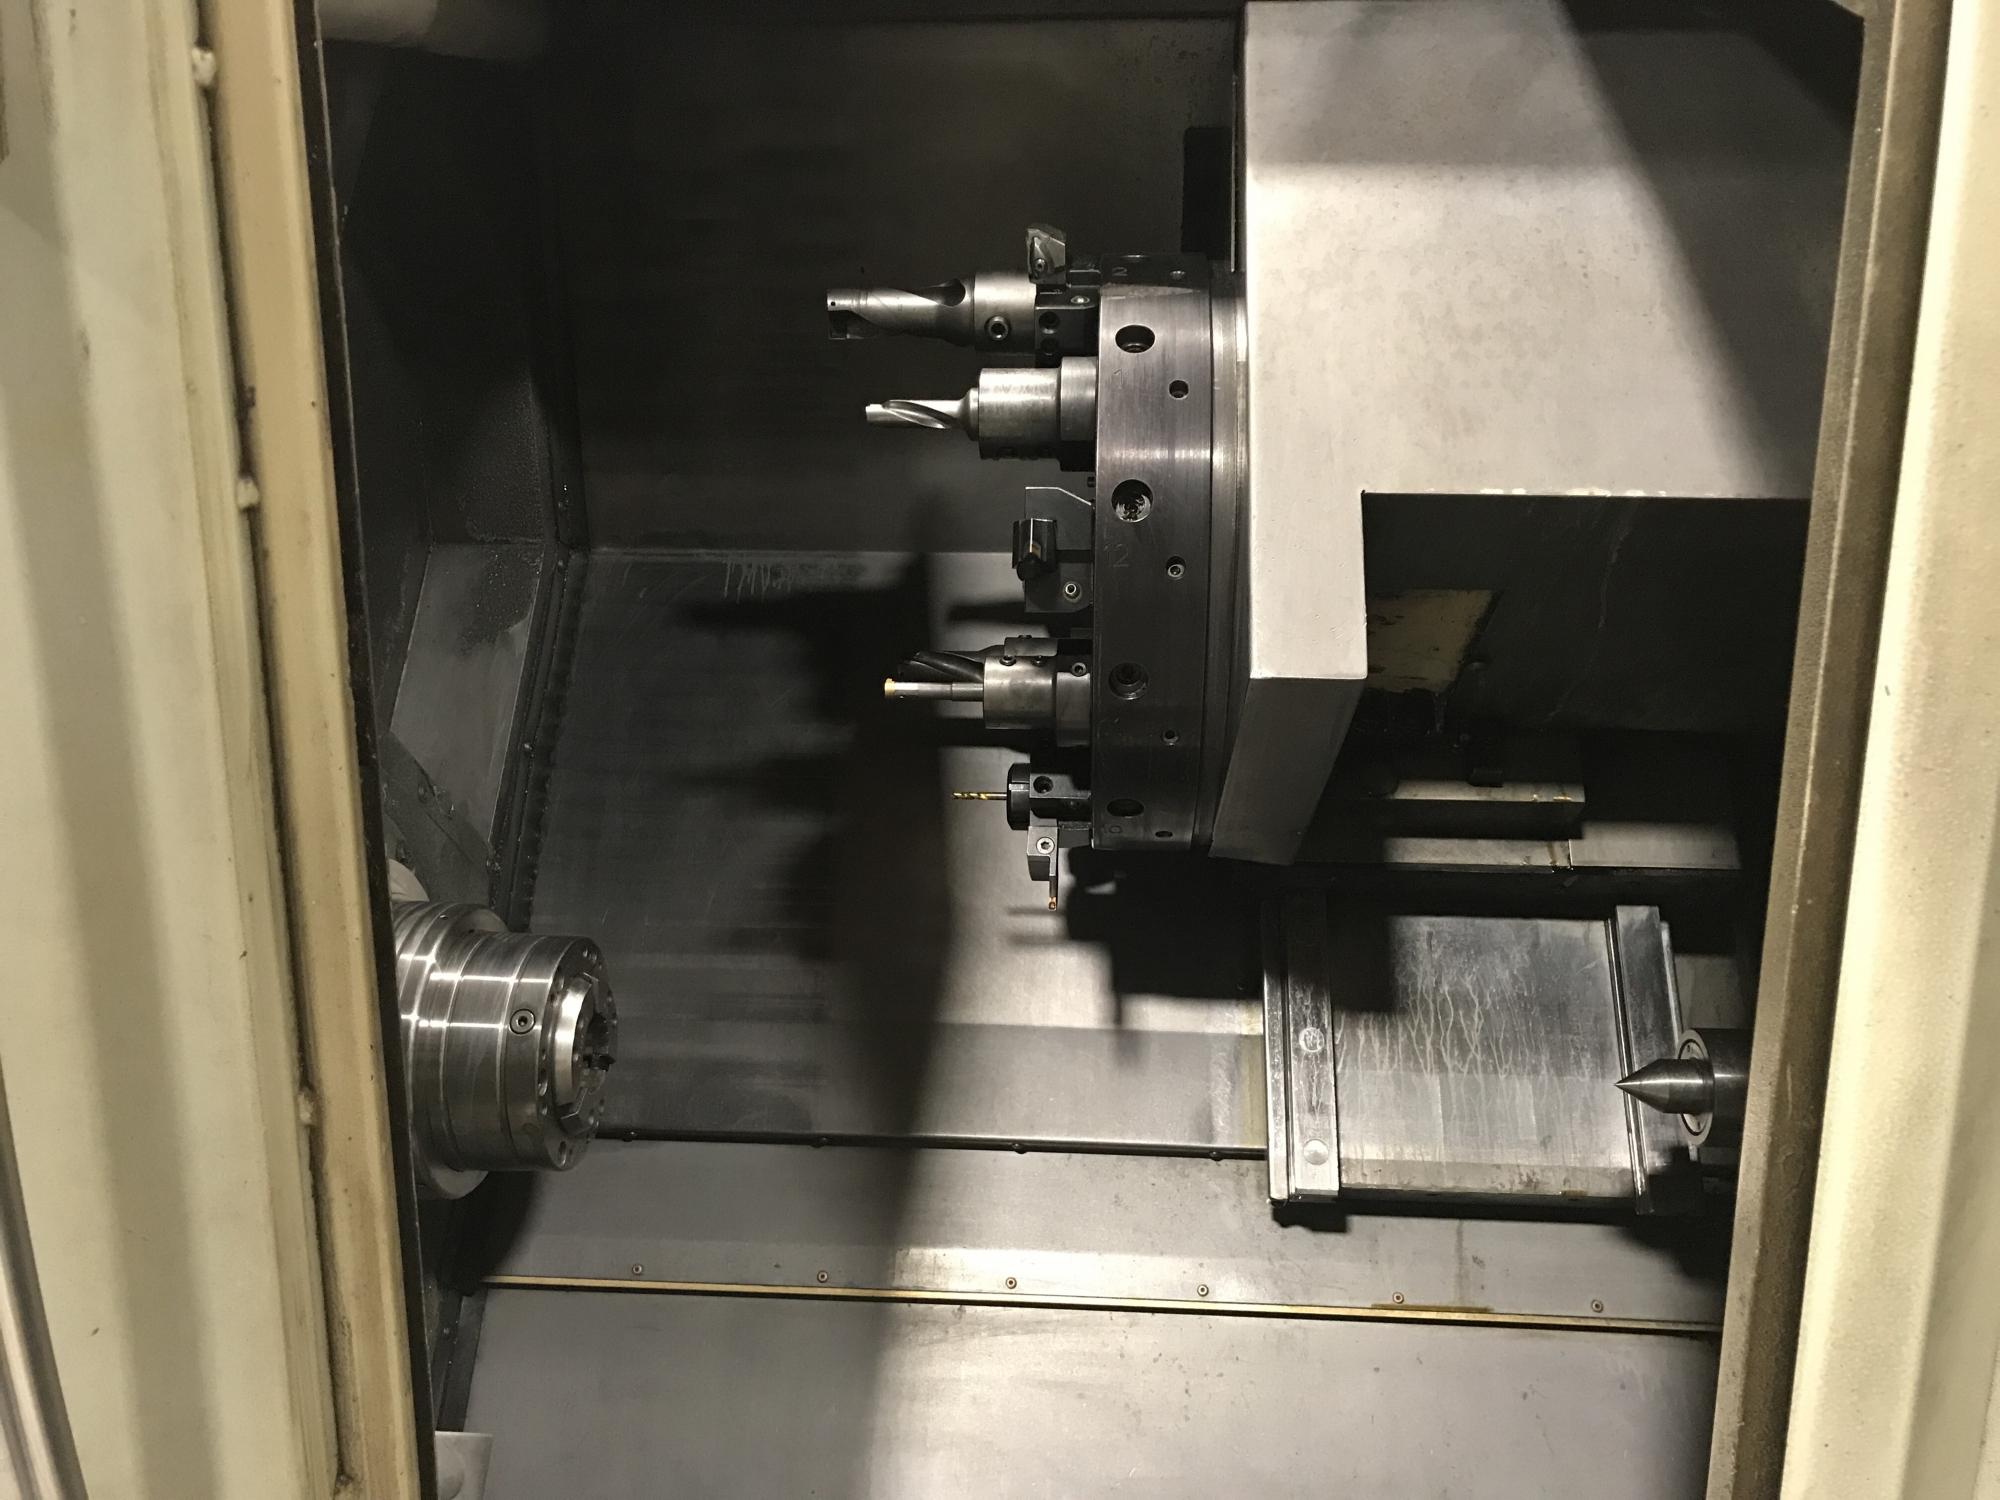 2007 GILDEMEISTER CTX-410 - CNC Horizontal Lathe